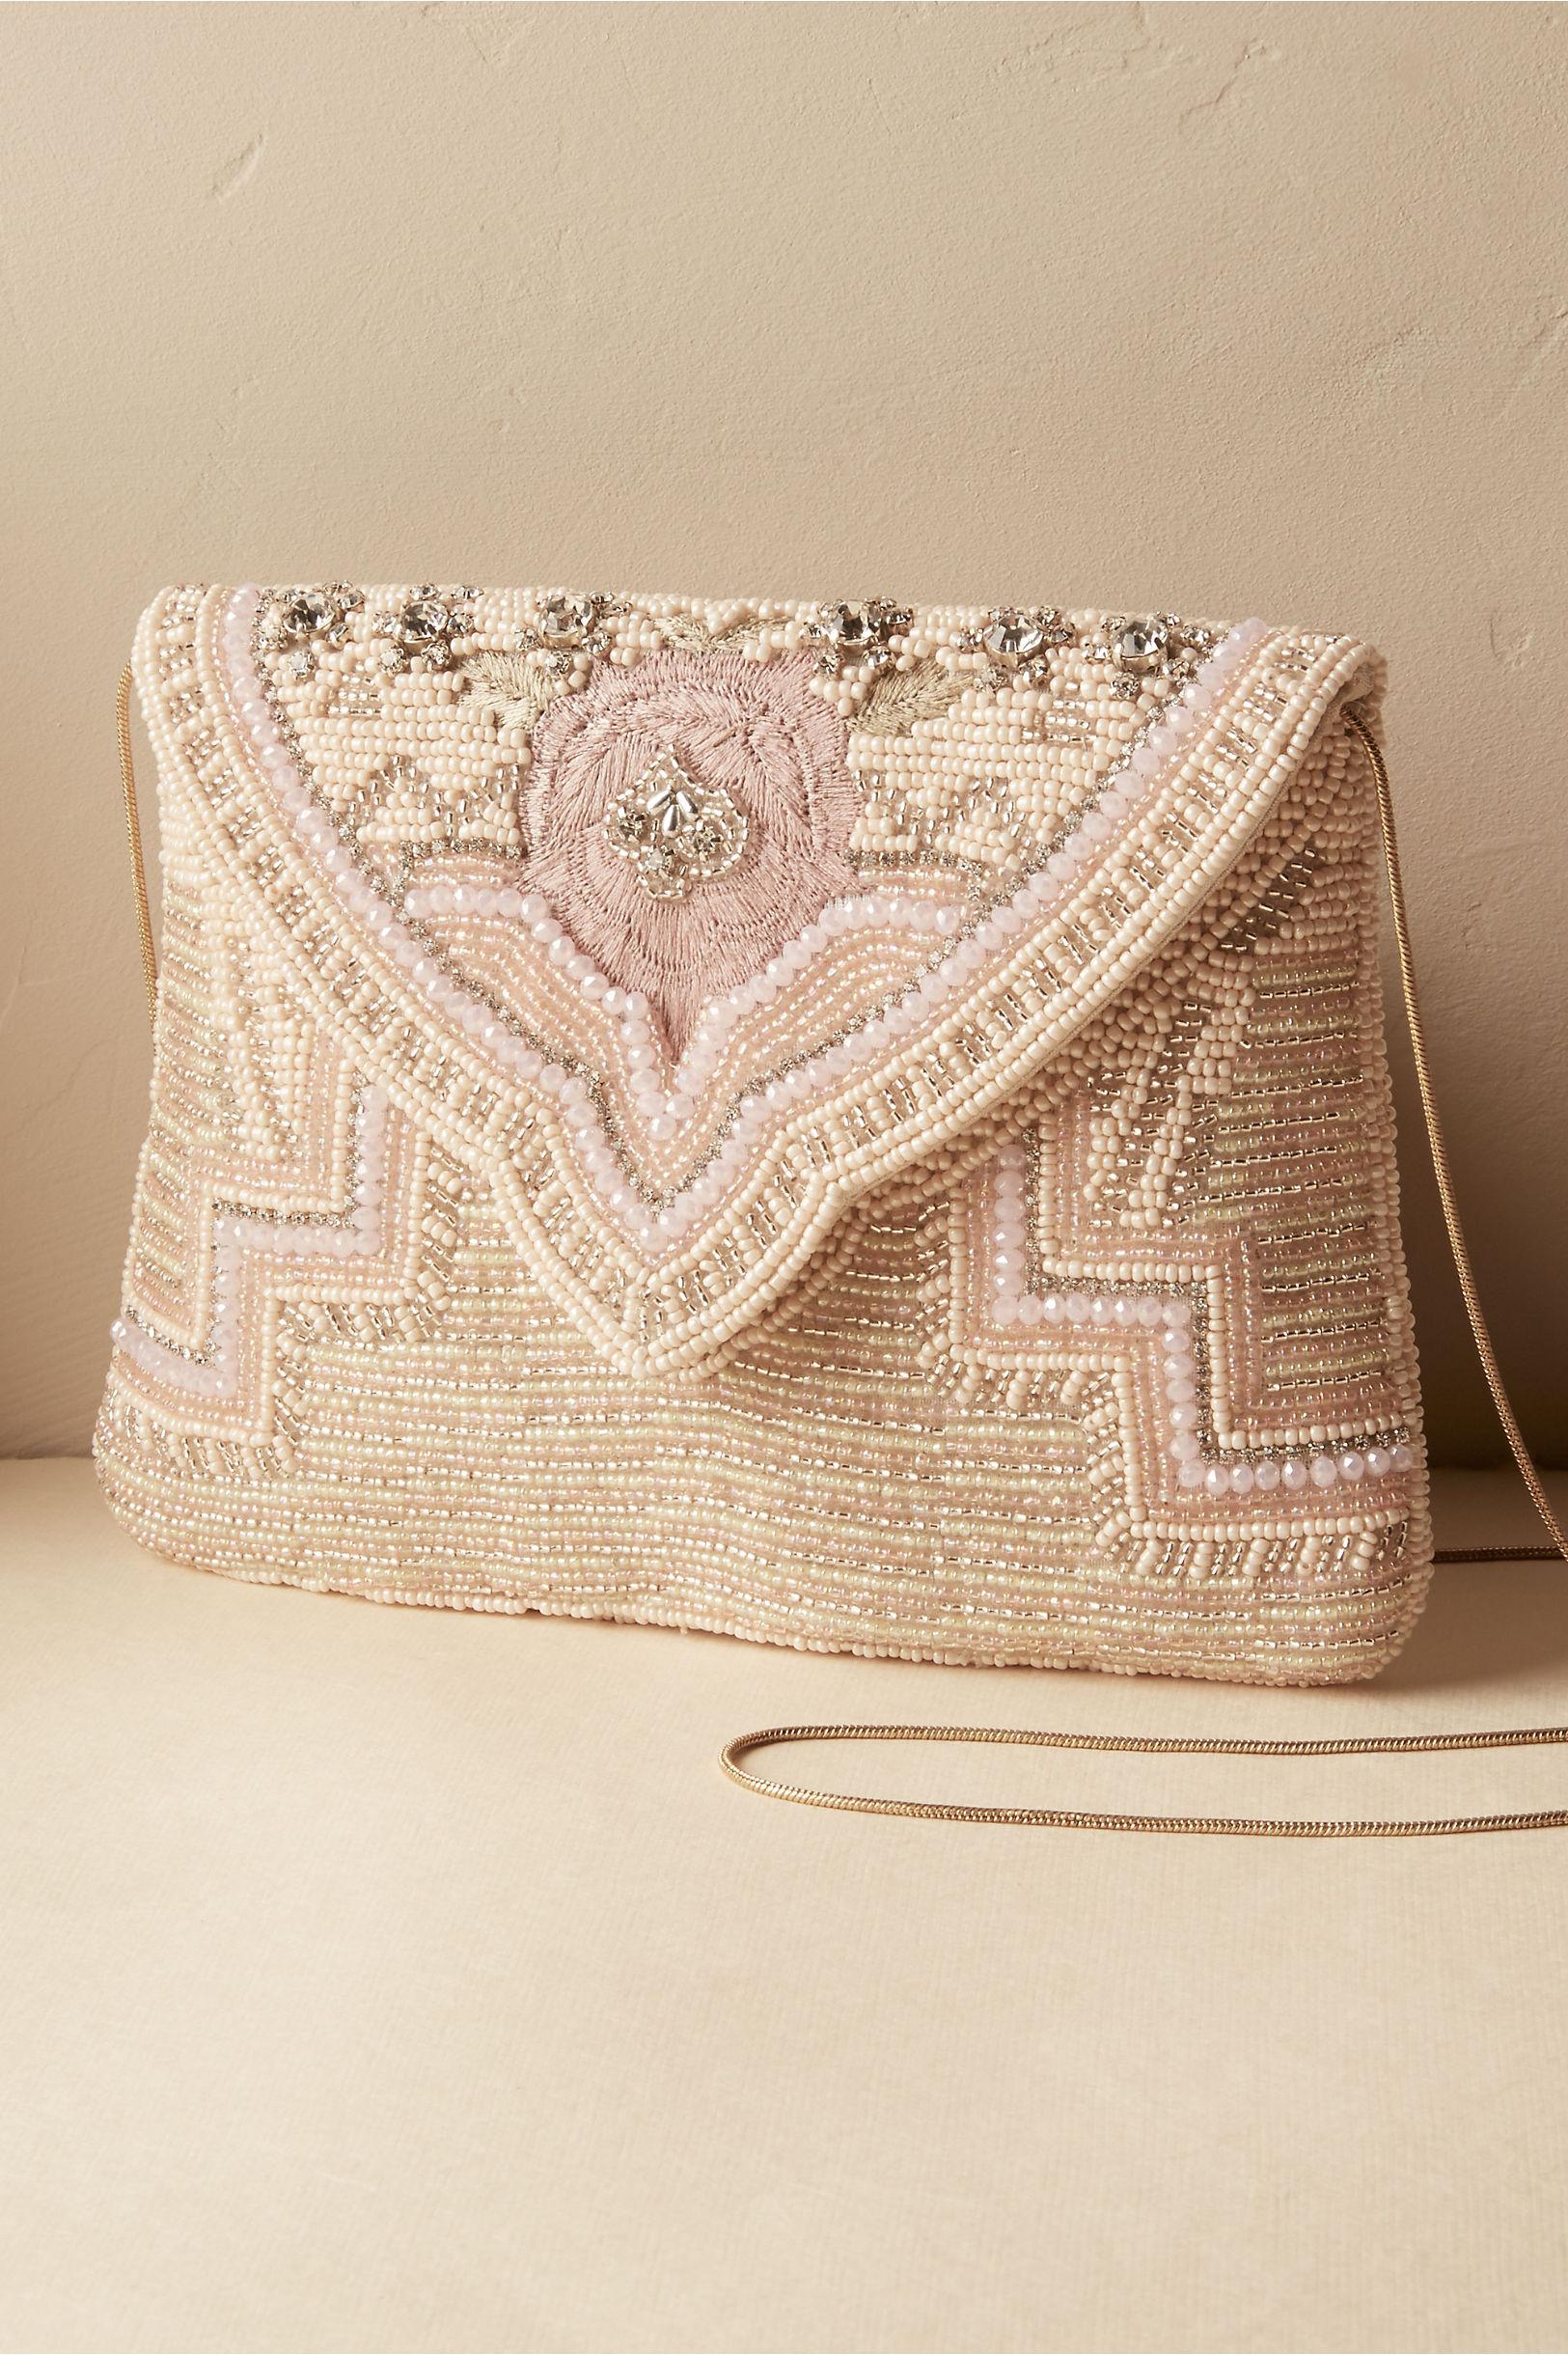 Vintage & Retro Handbags, Purses, Wallets, Bags Caroline Clutch $120.00 AT vintagedancer.com